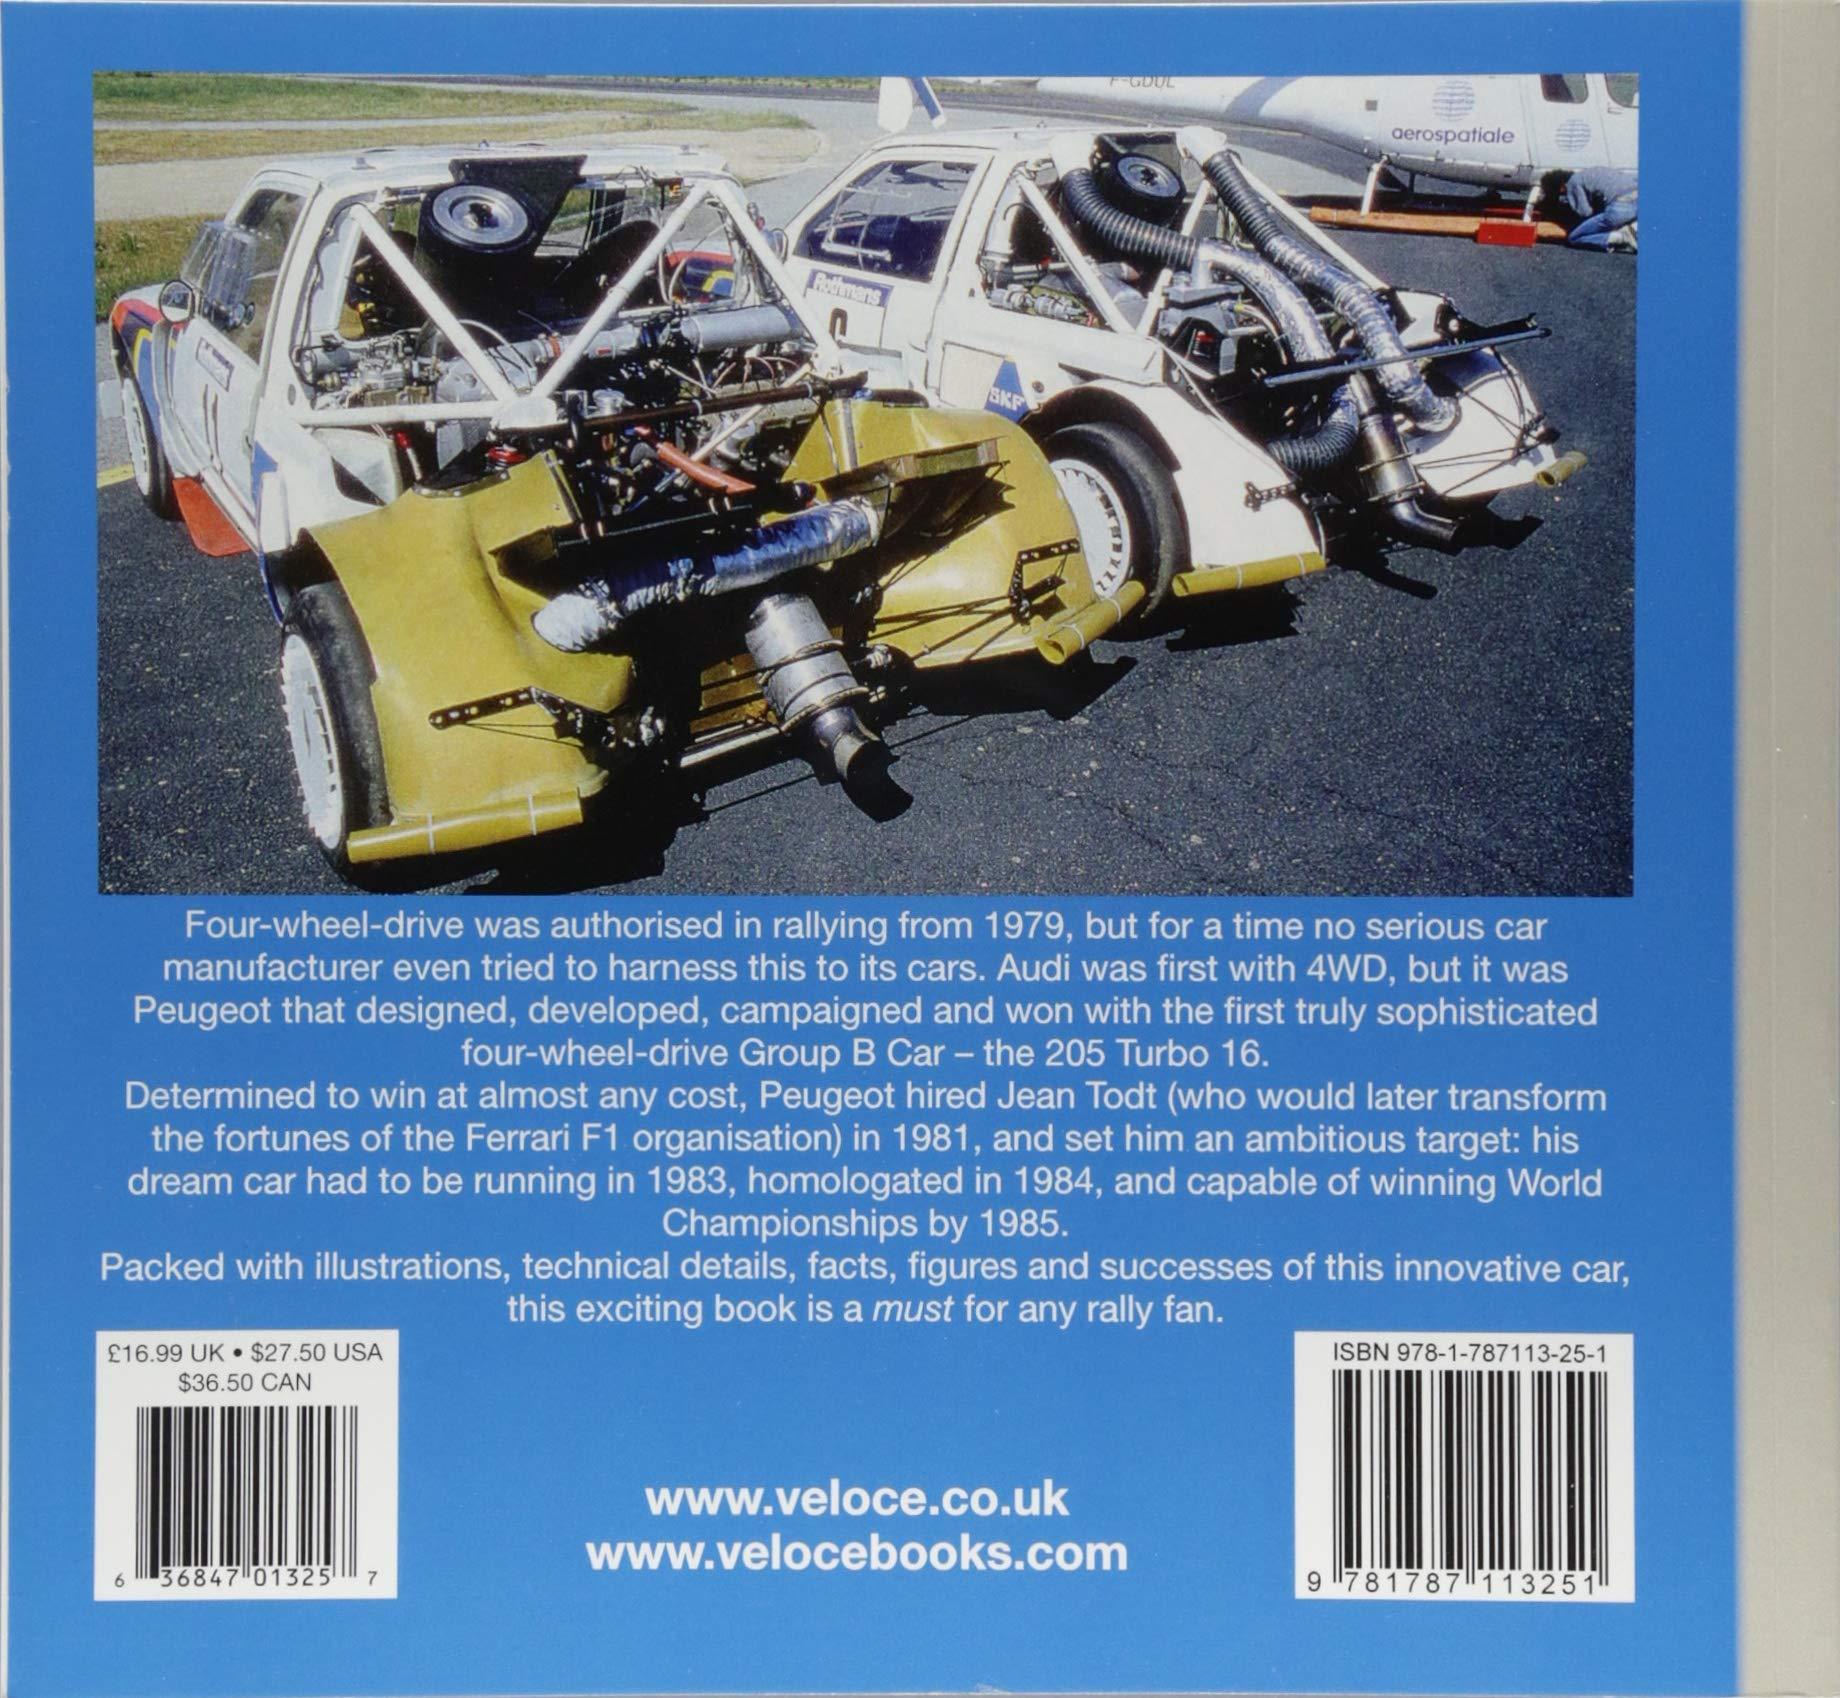 Peugeot 205 T16 (Rally Giants): Graham Robson: 9781787113251: Amazon.com: Books